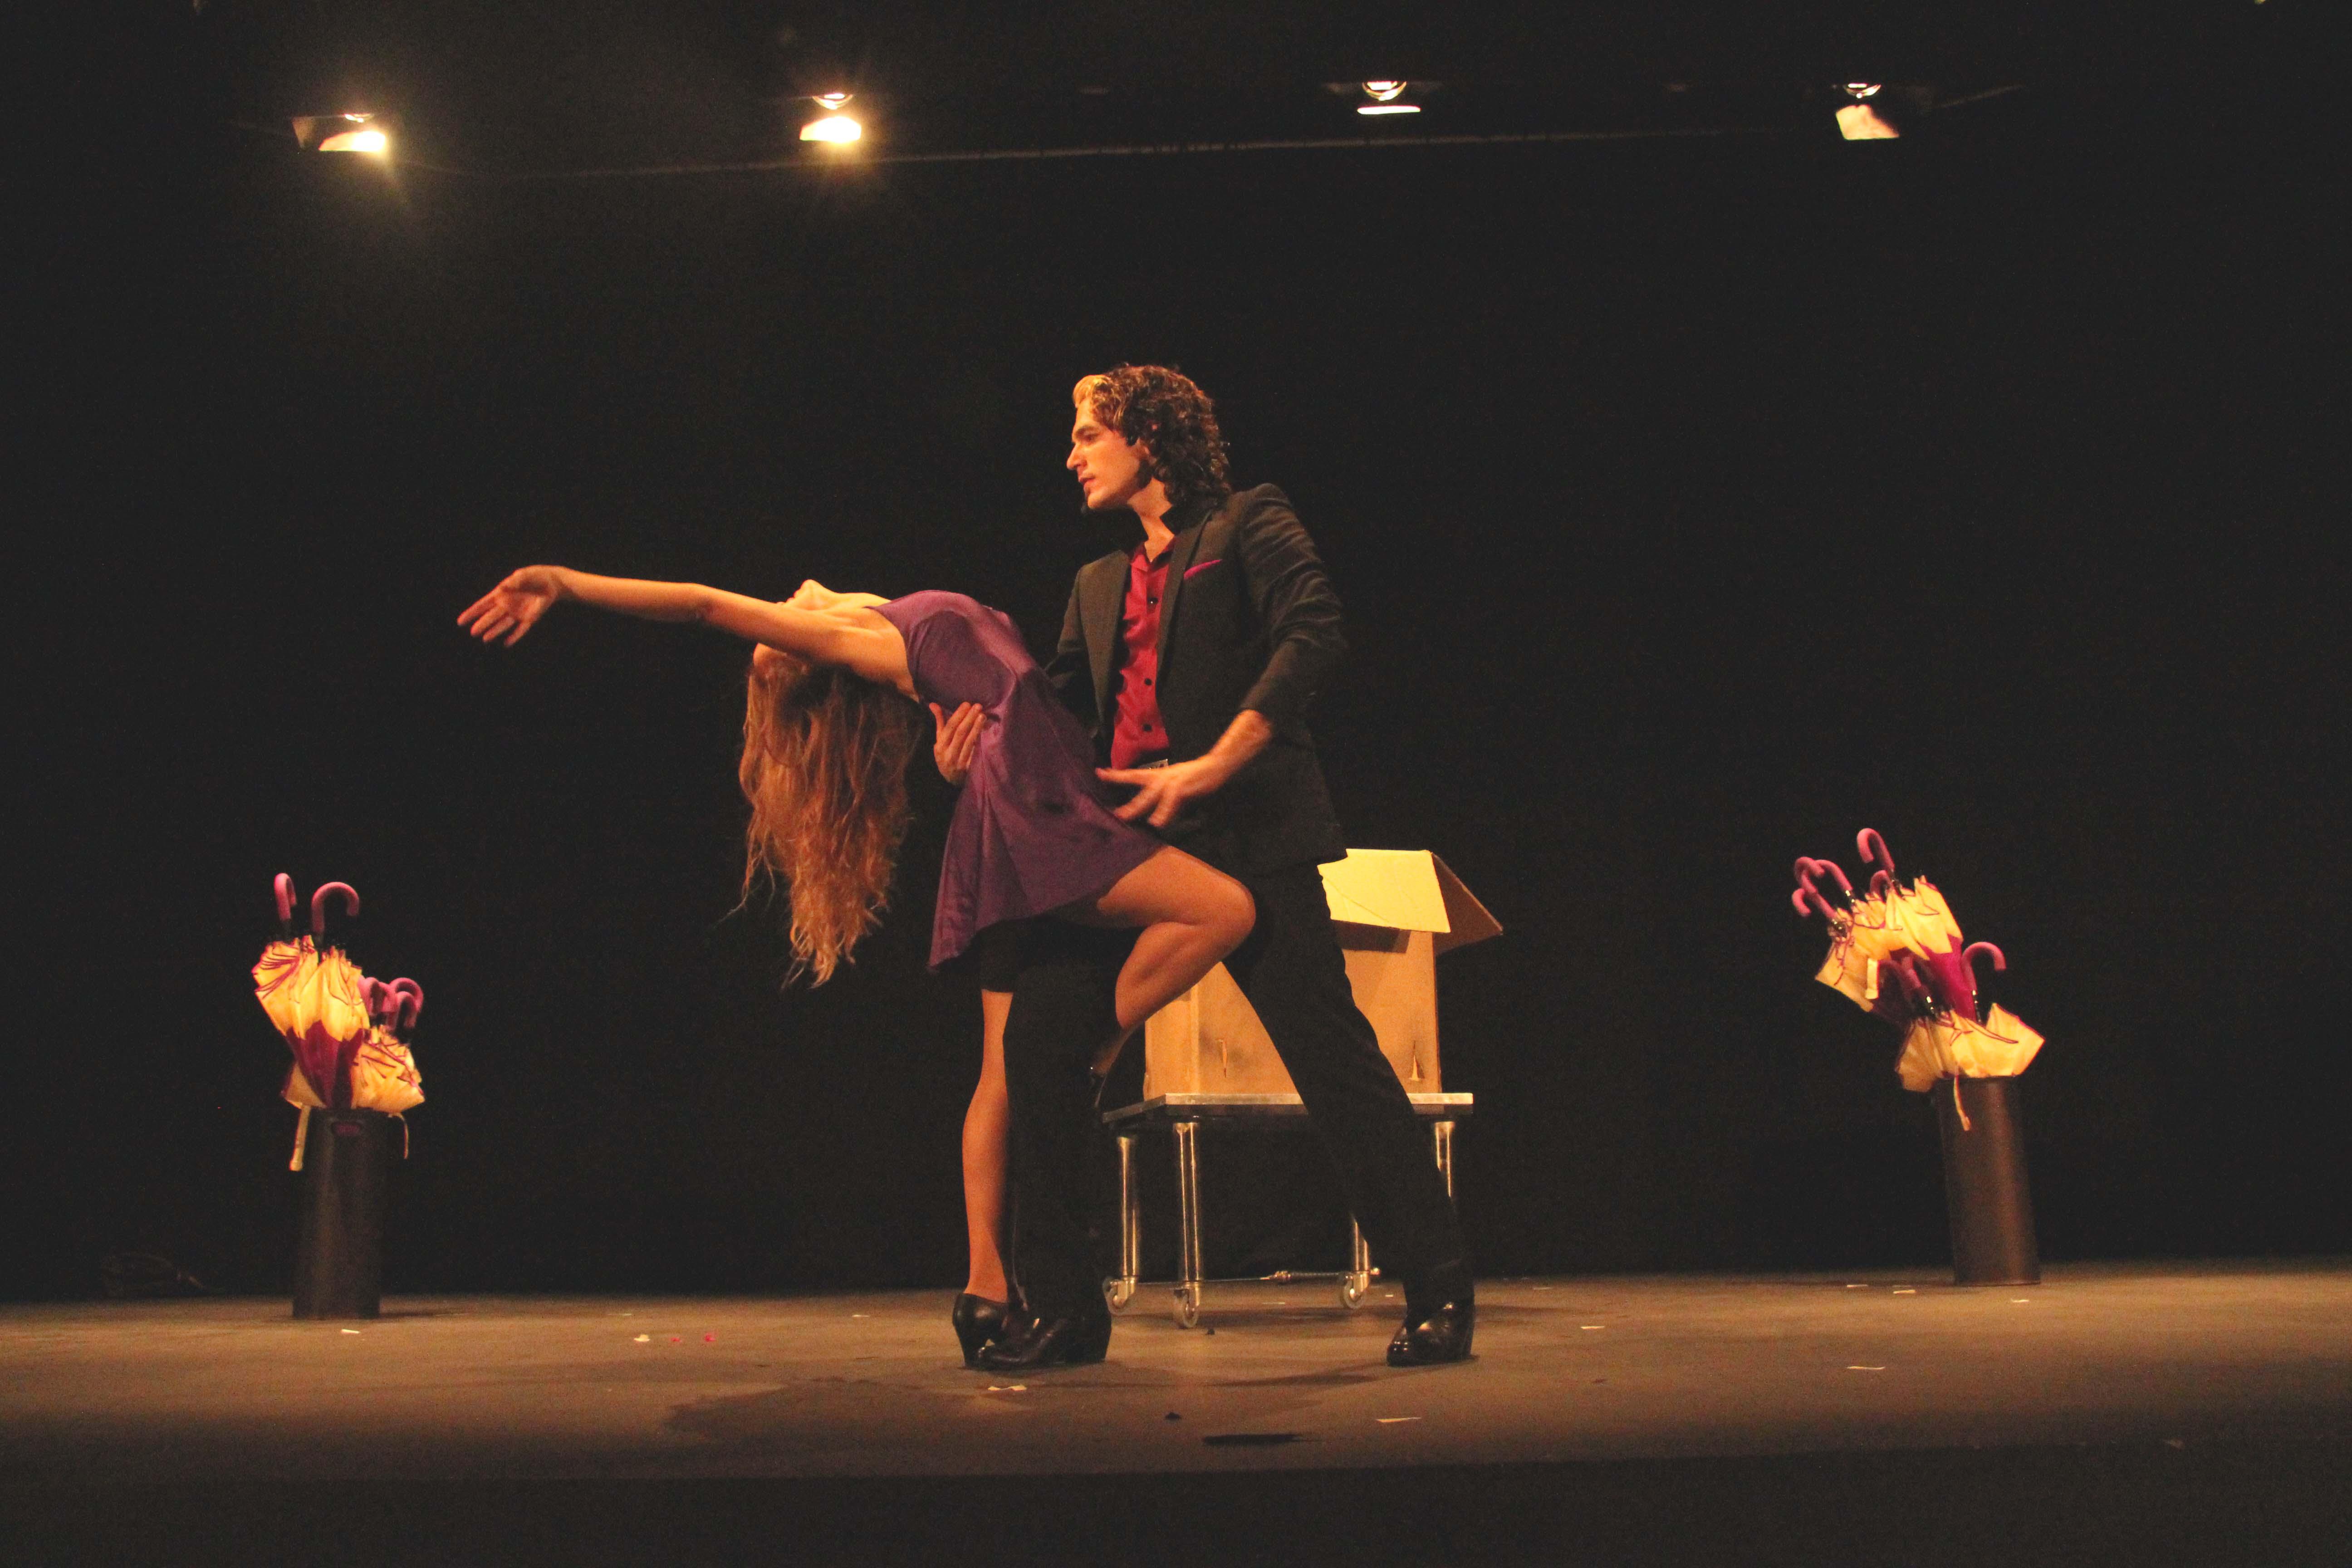 Daniel Ka & Lau by Eva R. Luque